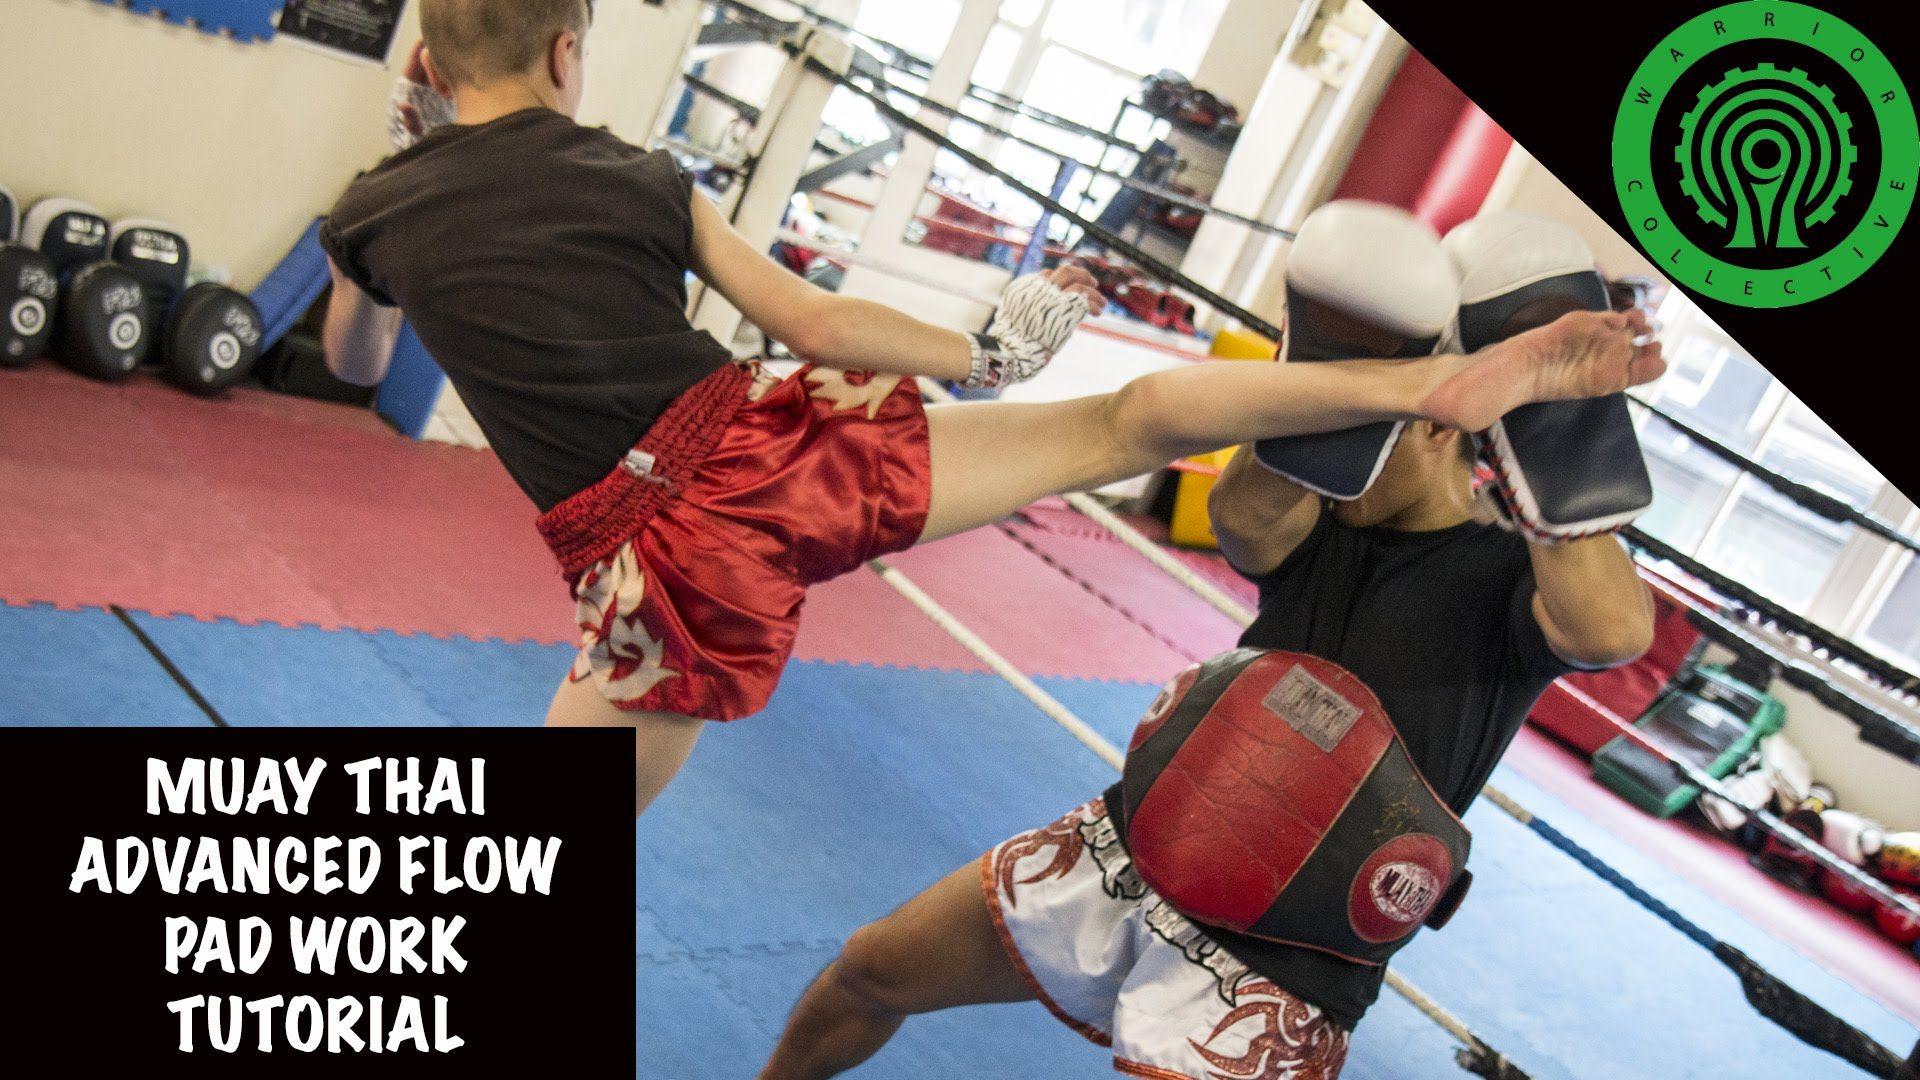 Muay Thai Advanced Flow Pad Work Tutorial